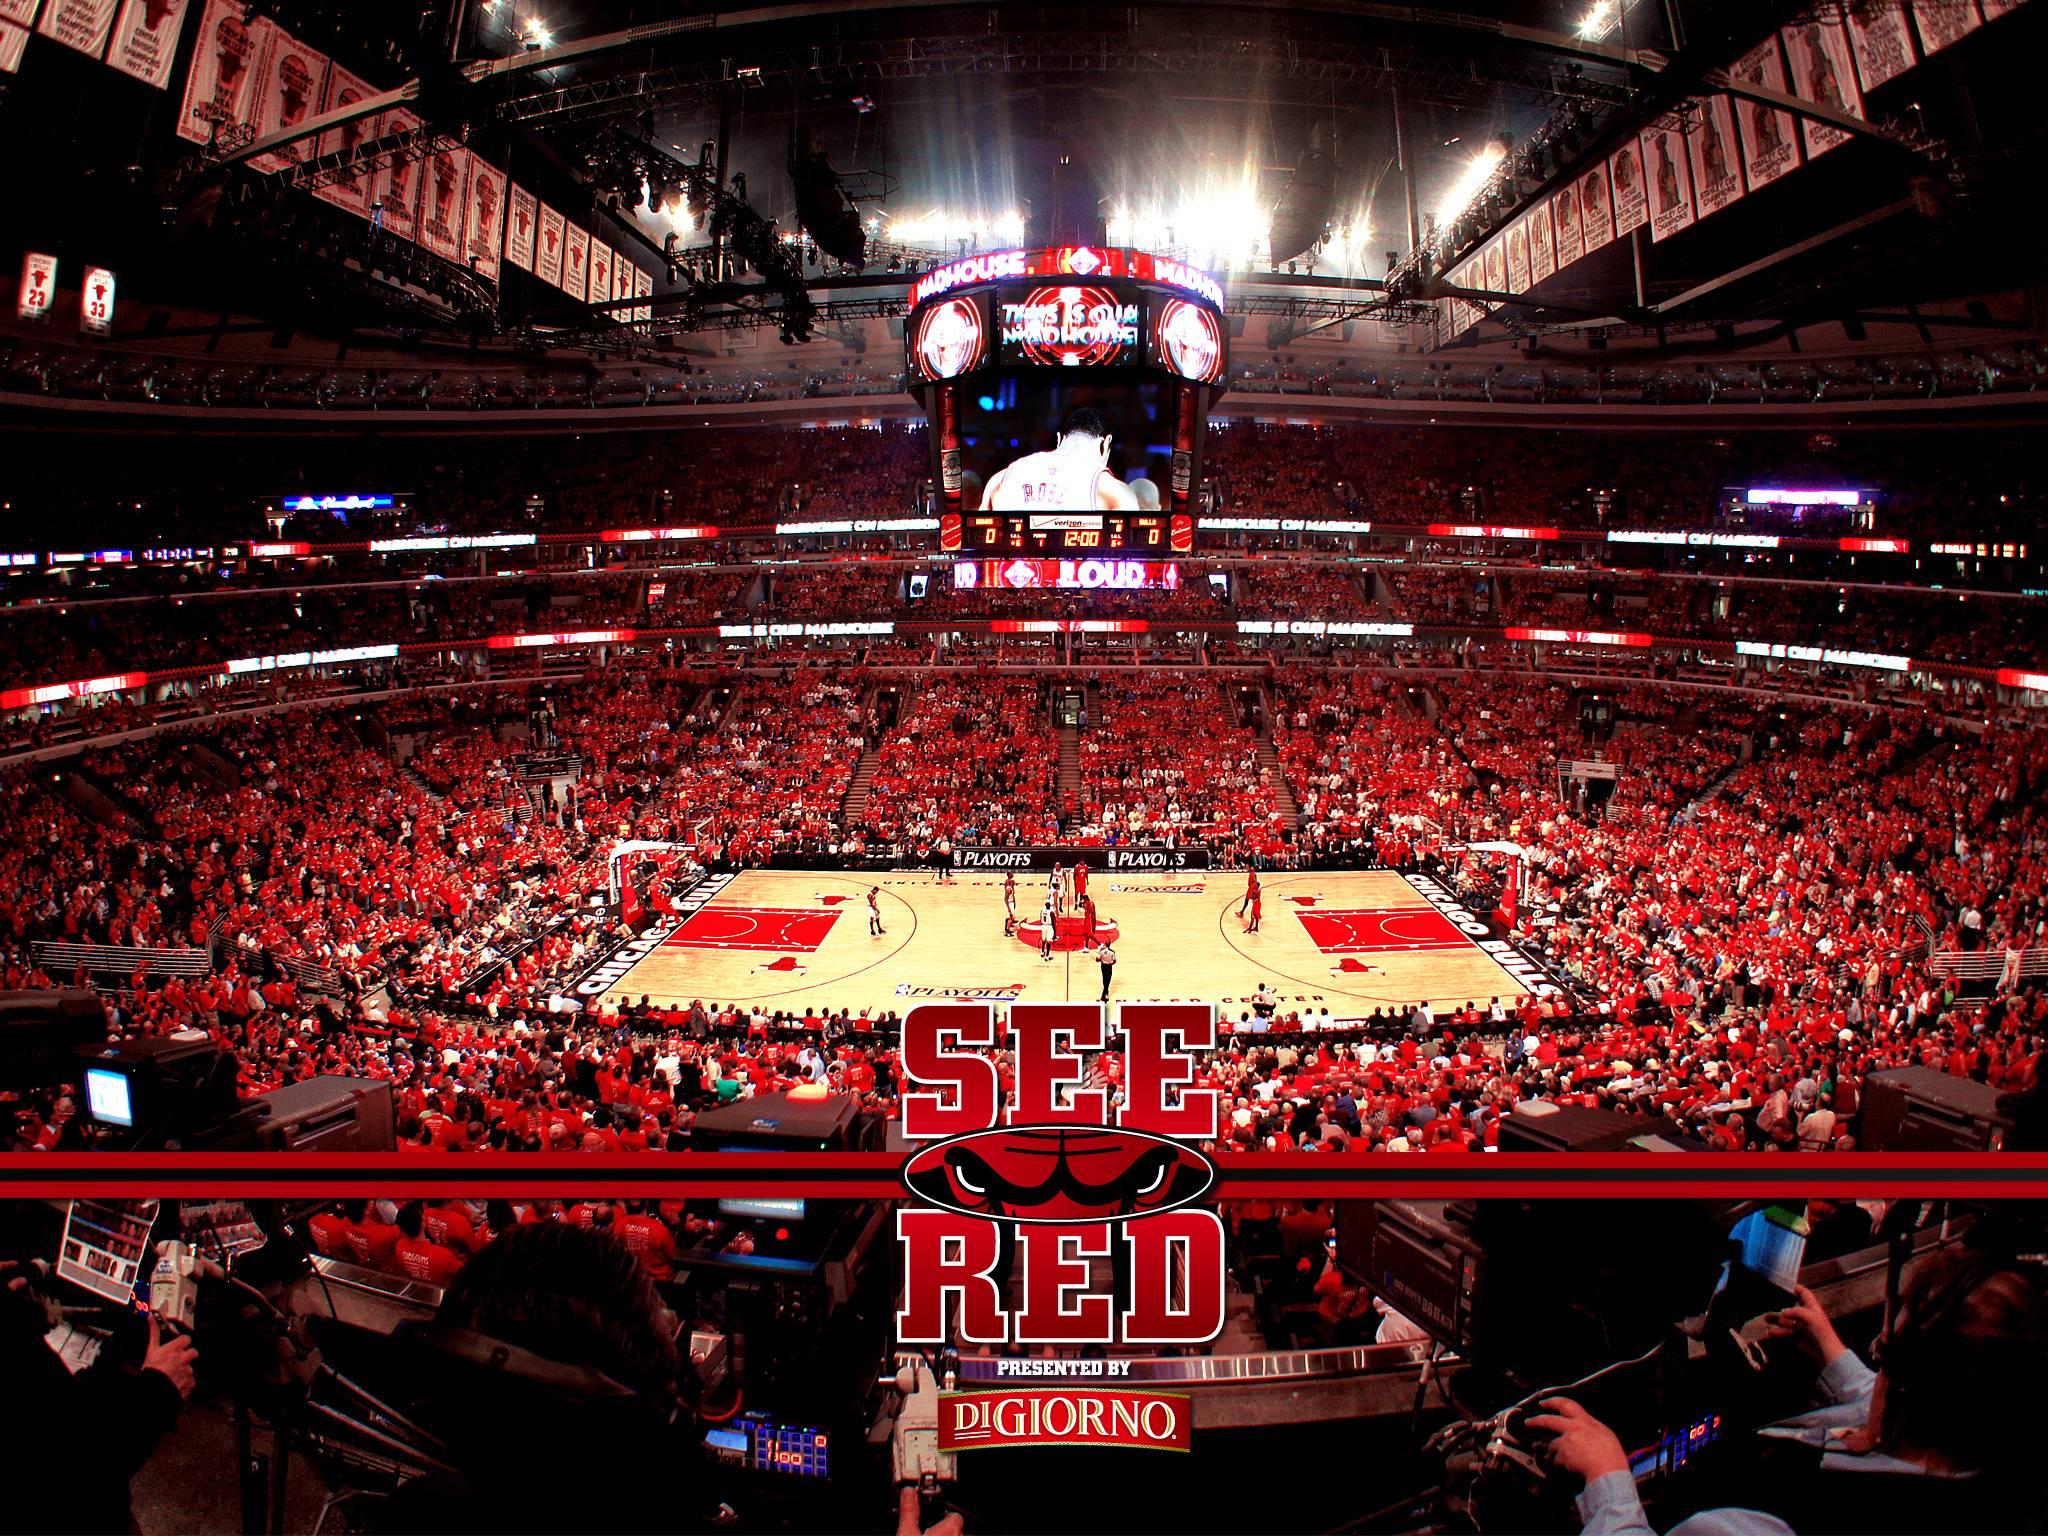 Hd Blackhawks Wallpaper Chicago Bulls Wallpaper Hd Pixelstalk Net